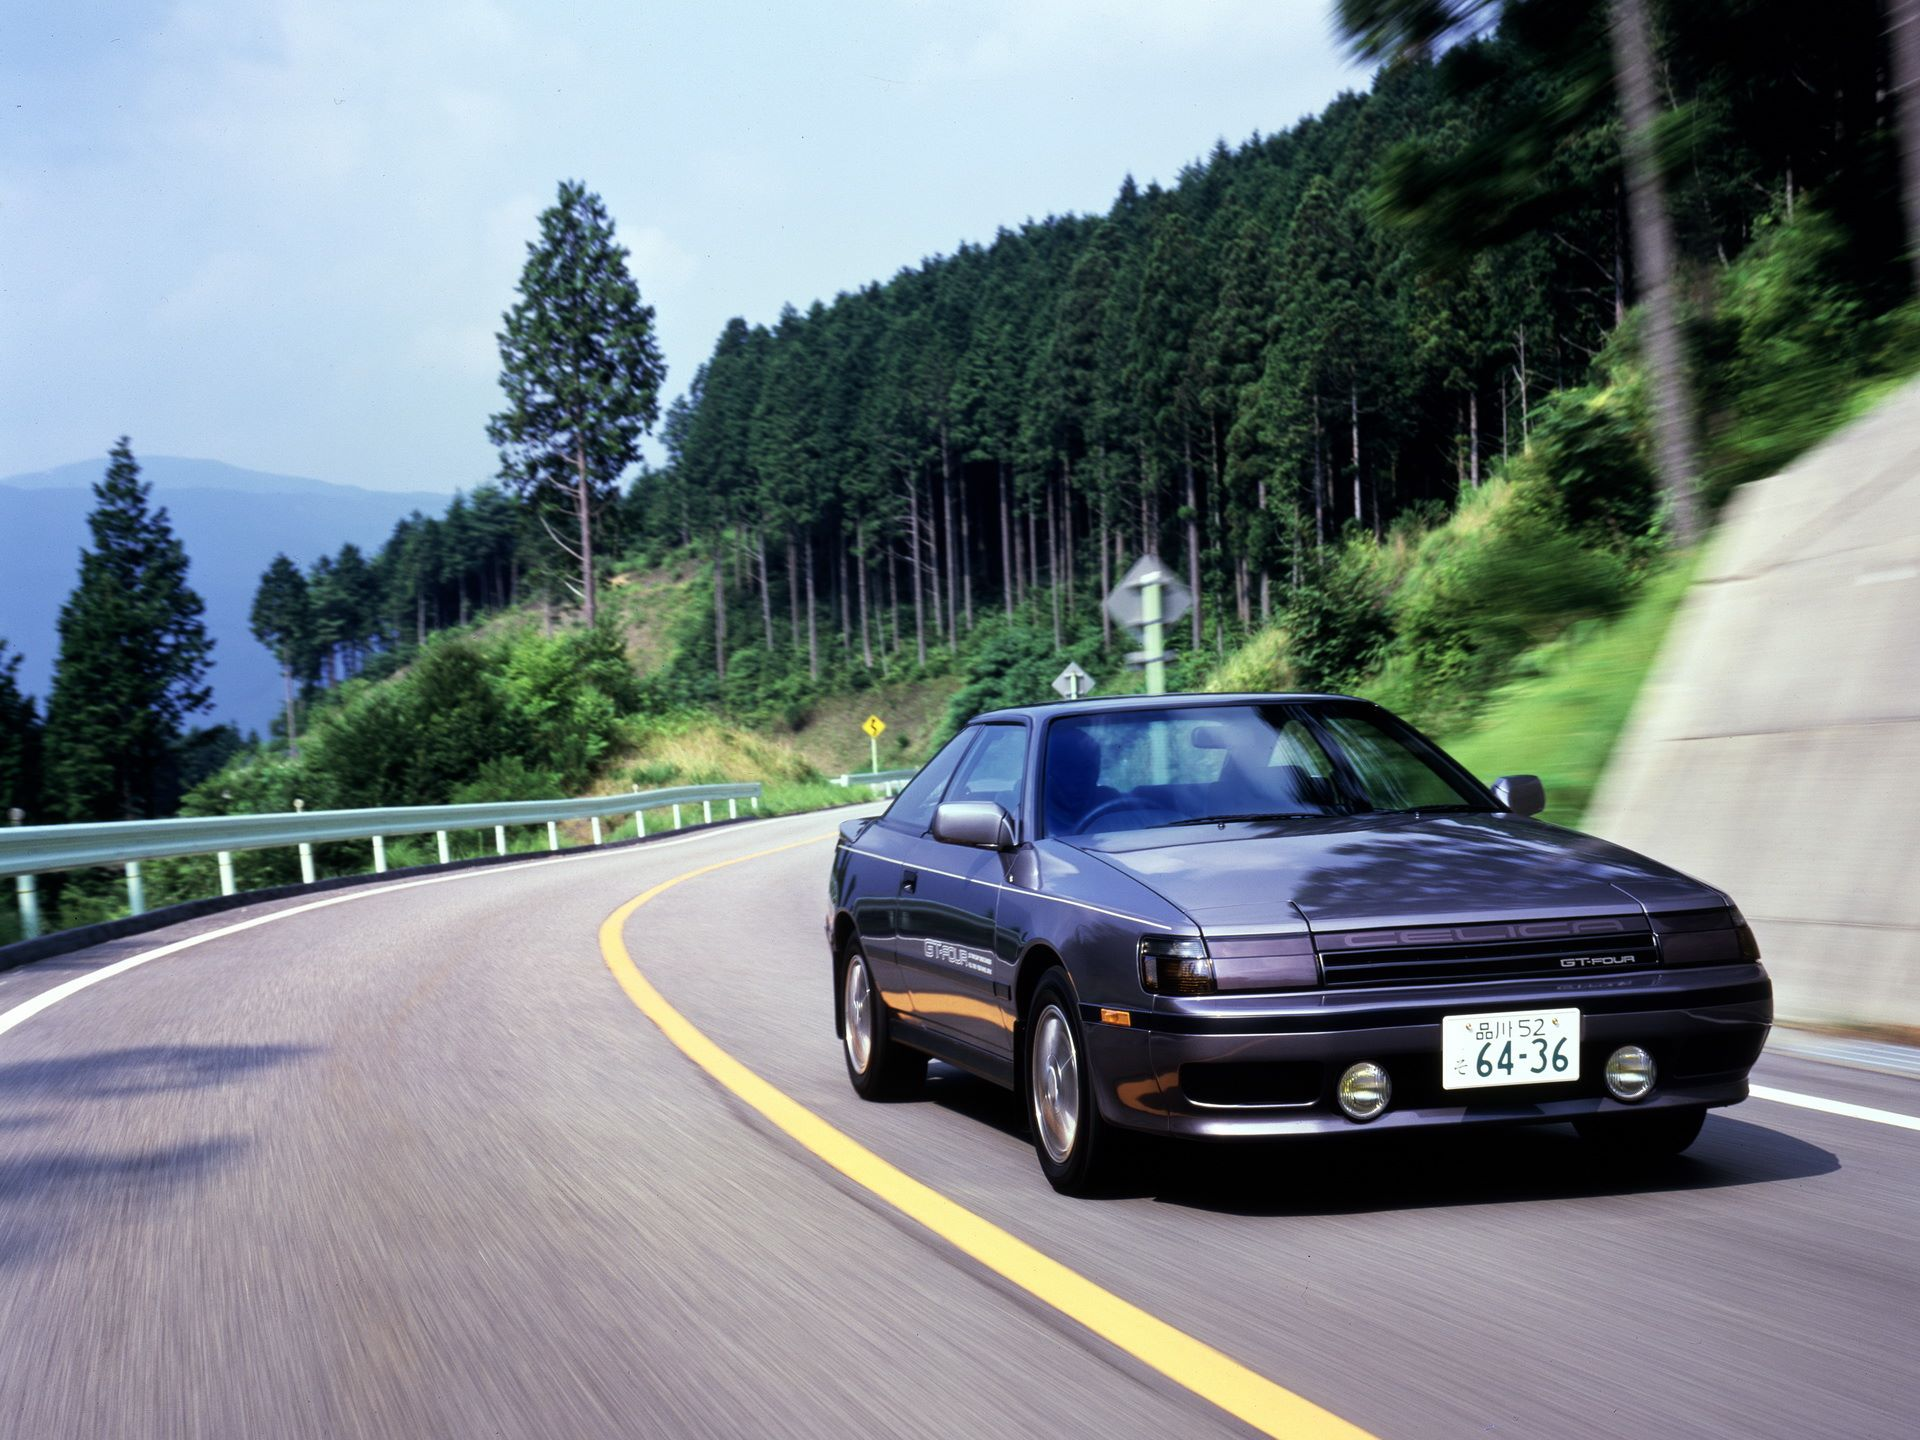 Toyota-Celica-50-years-24